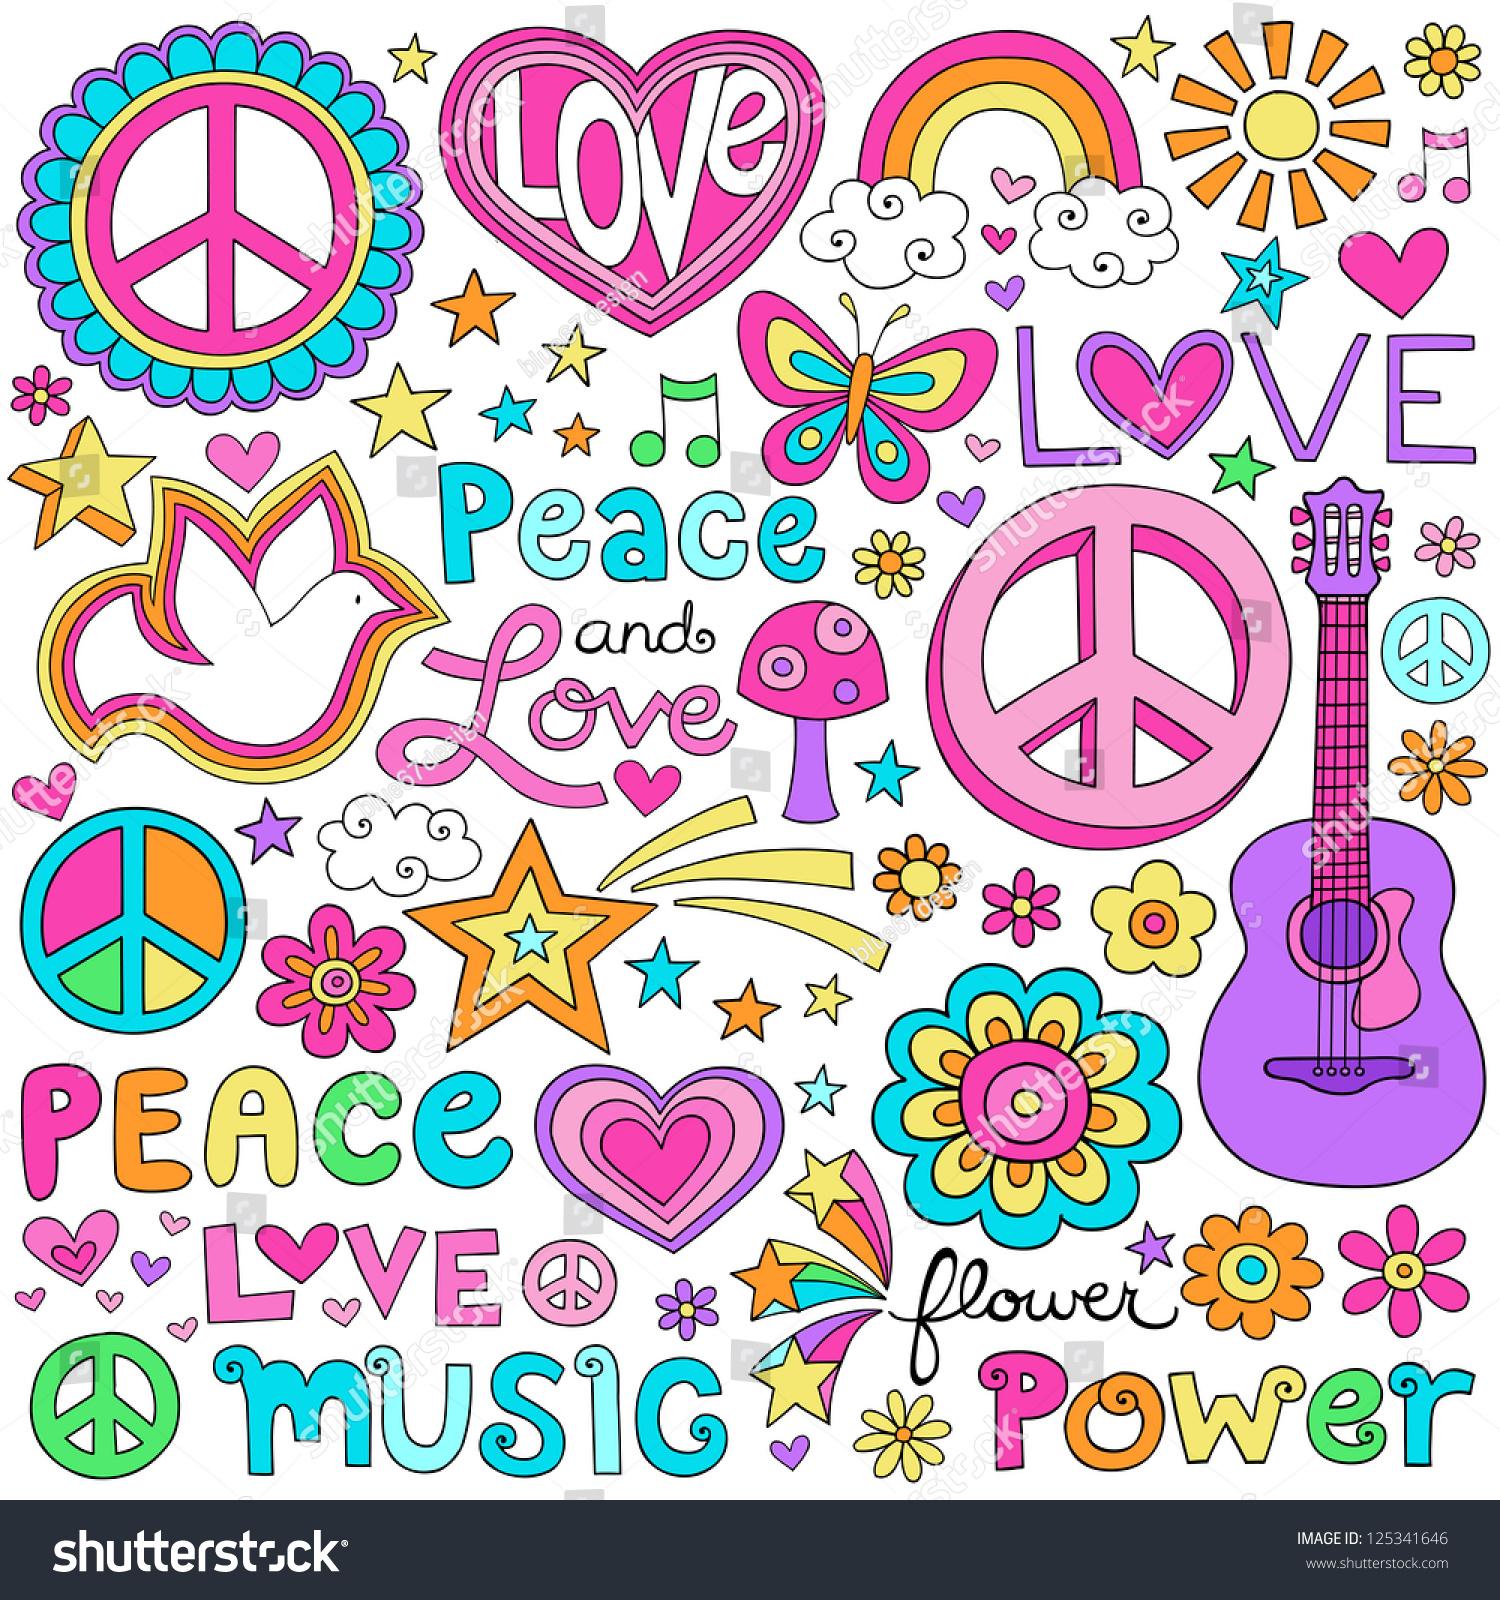 peace love dove flower power groovy stock vector 125341646 shutterstock. Black Bedroom Furniture Sets. Home Design Ideas